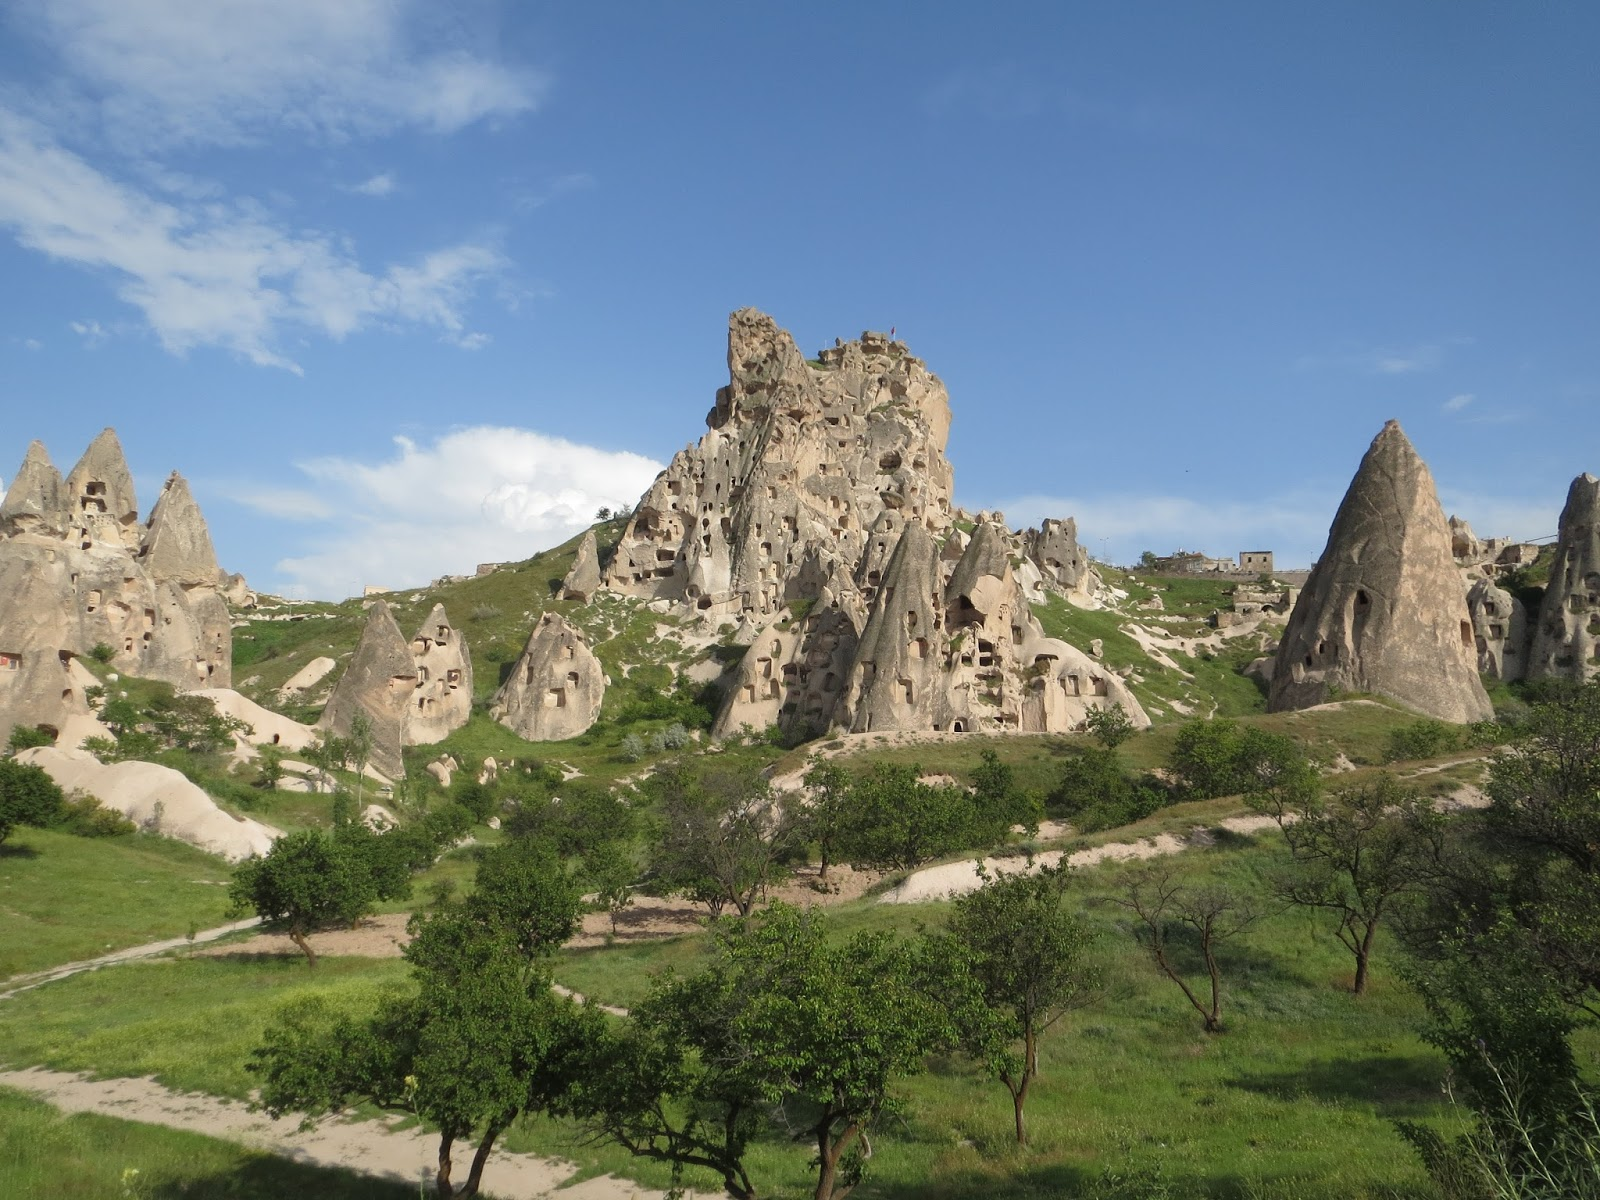 londinoupolis: Uchisar Castle, Cappadocia